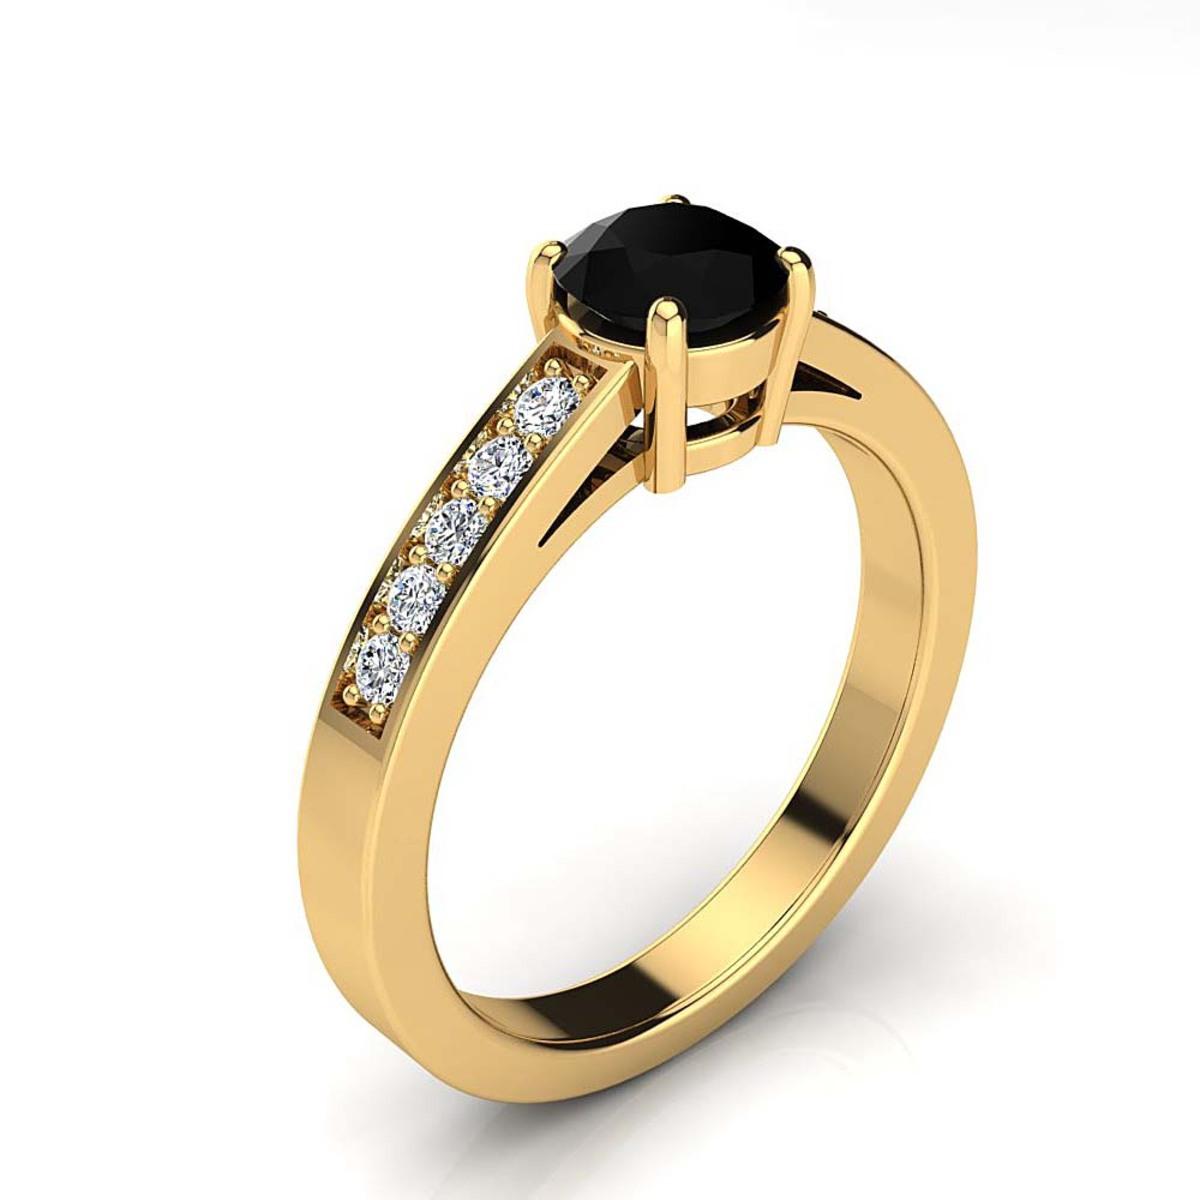 Luxurman 14K Gold White and Black Diamond Engagement Ring 0.65ct